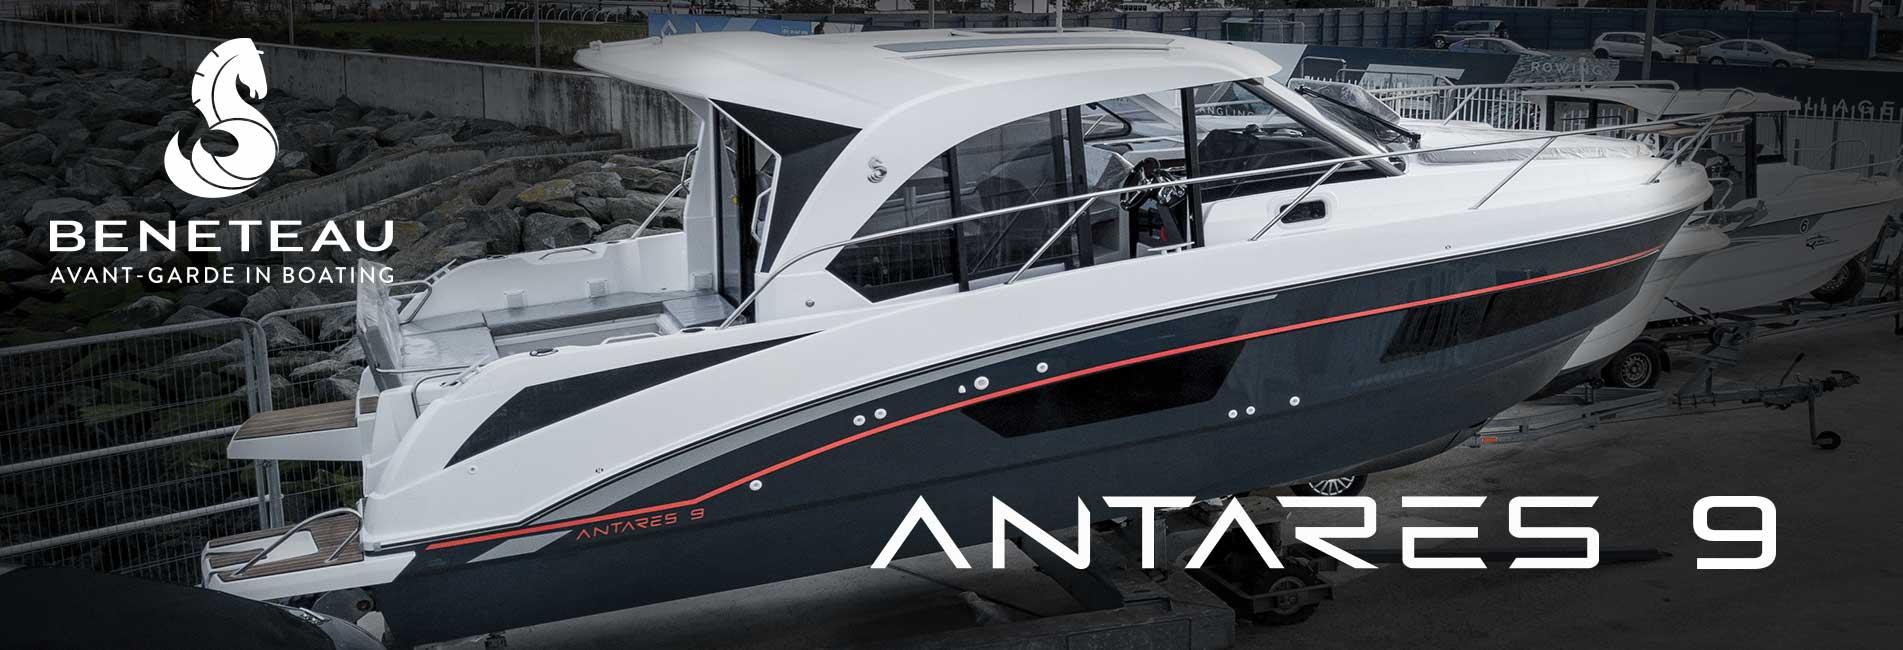 Antares 9